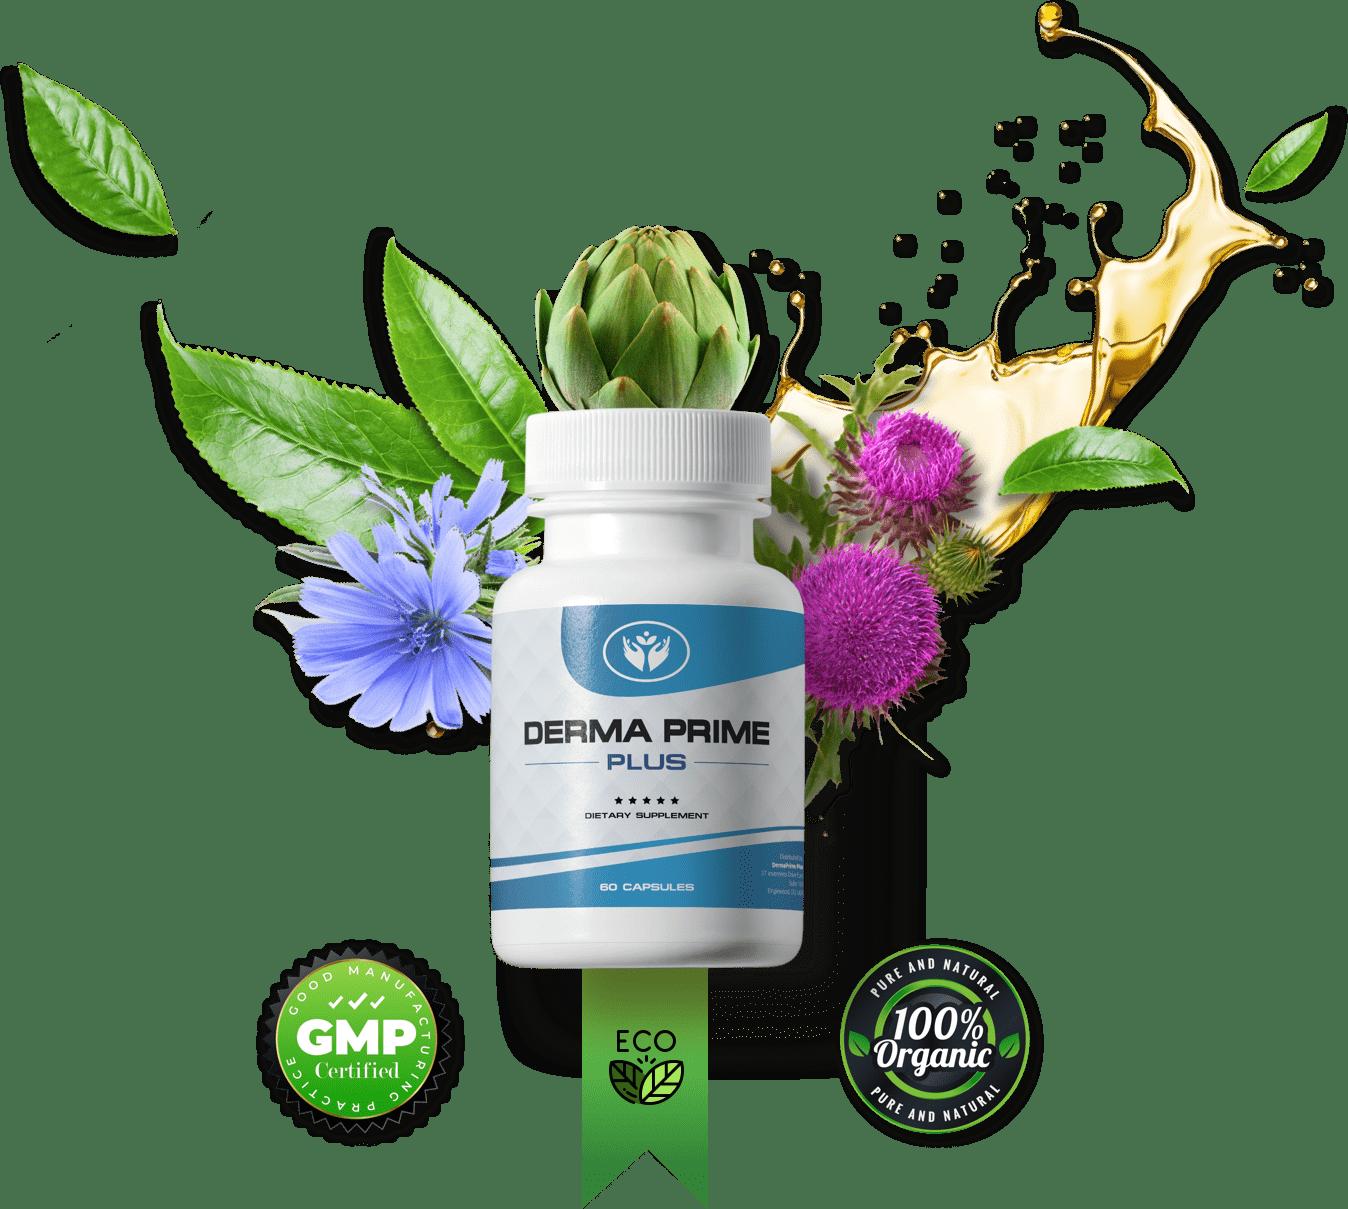 Derma Prime Plus Ingredients Reviews: SCAM? My Report! – Business